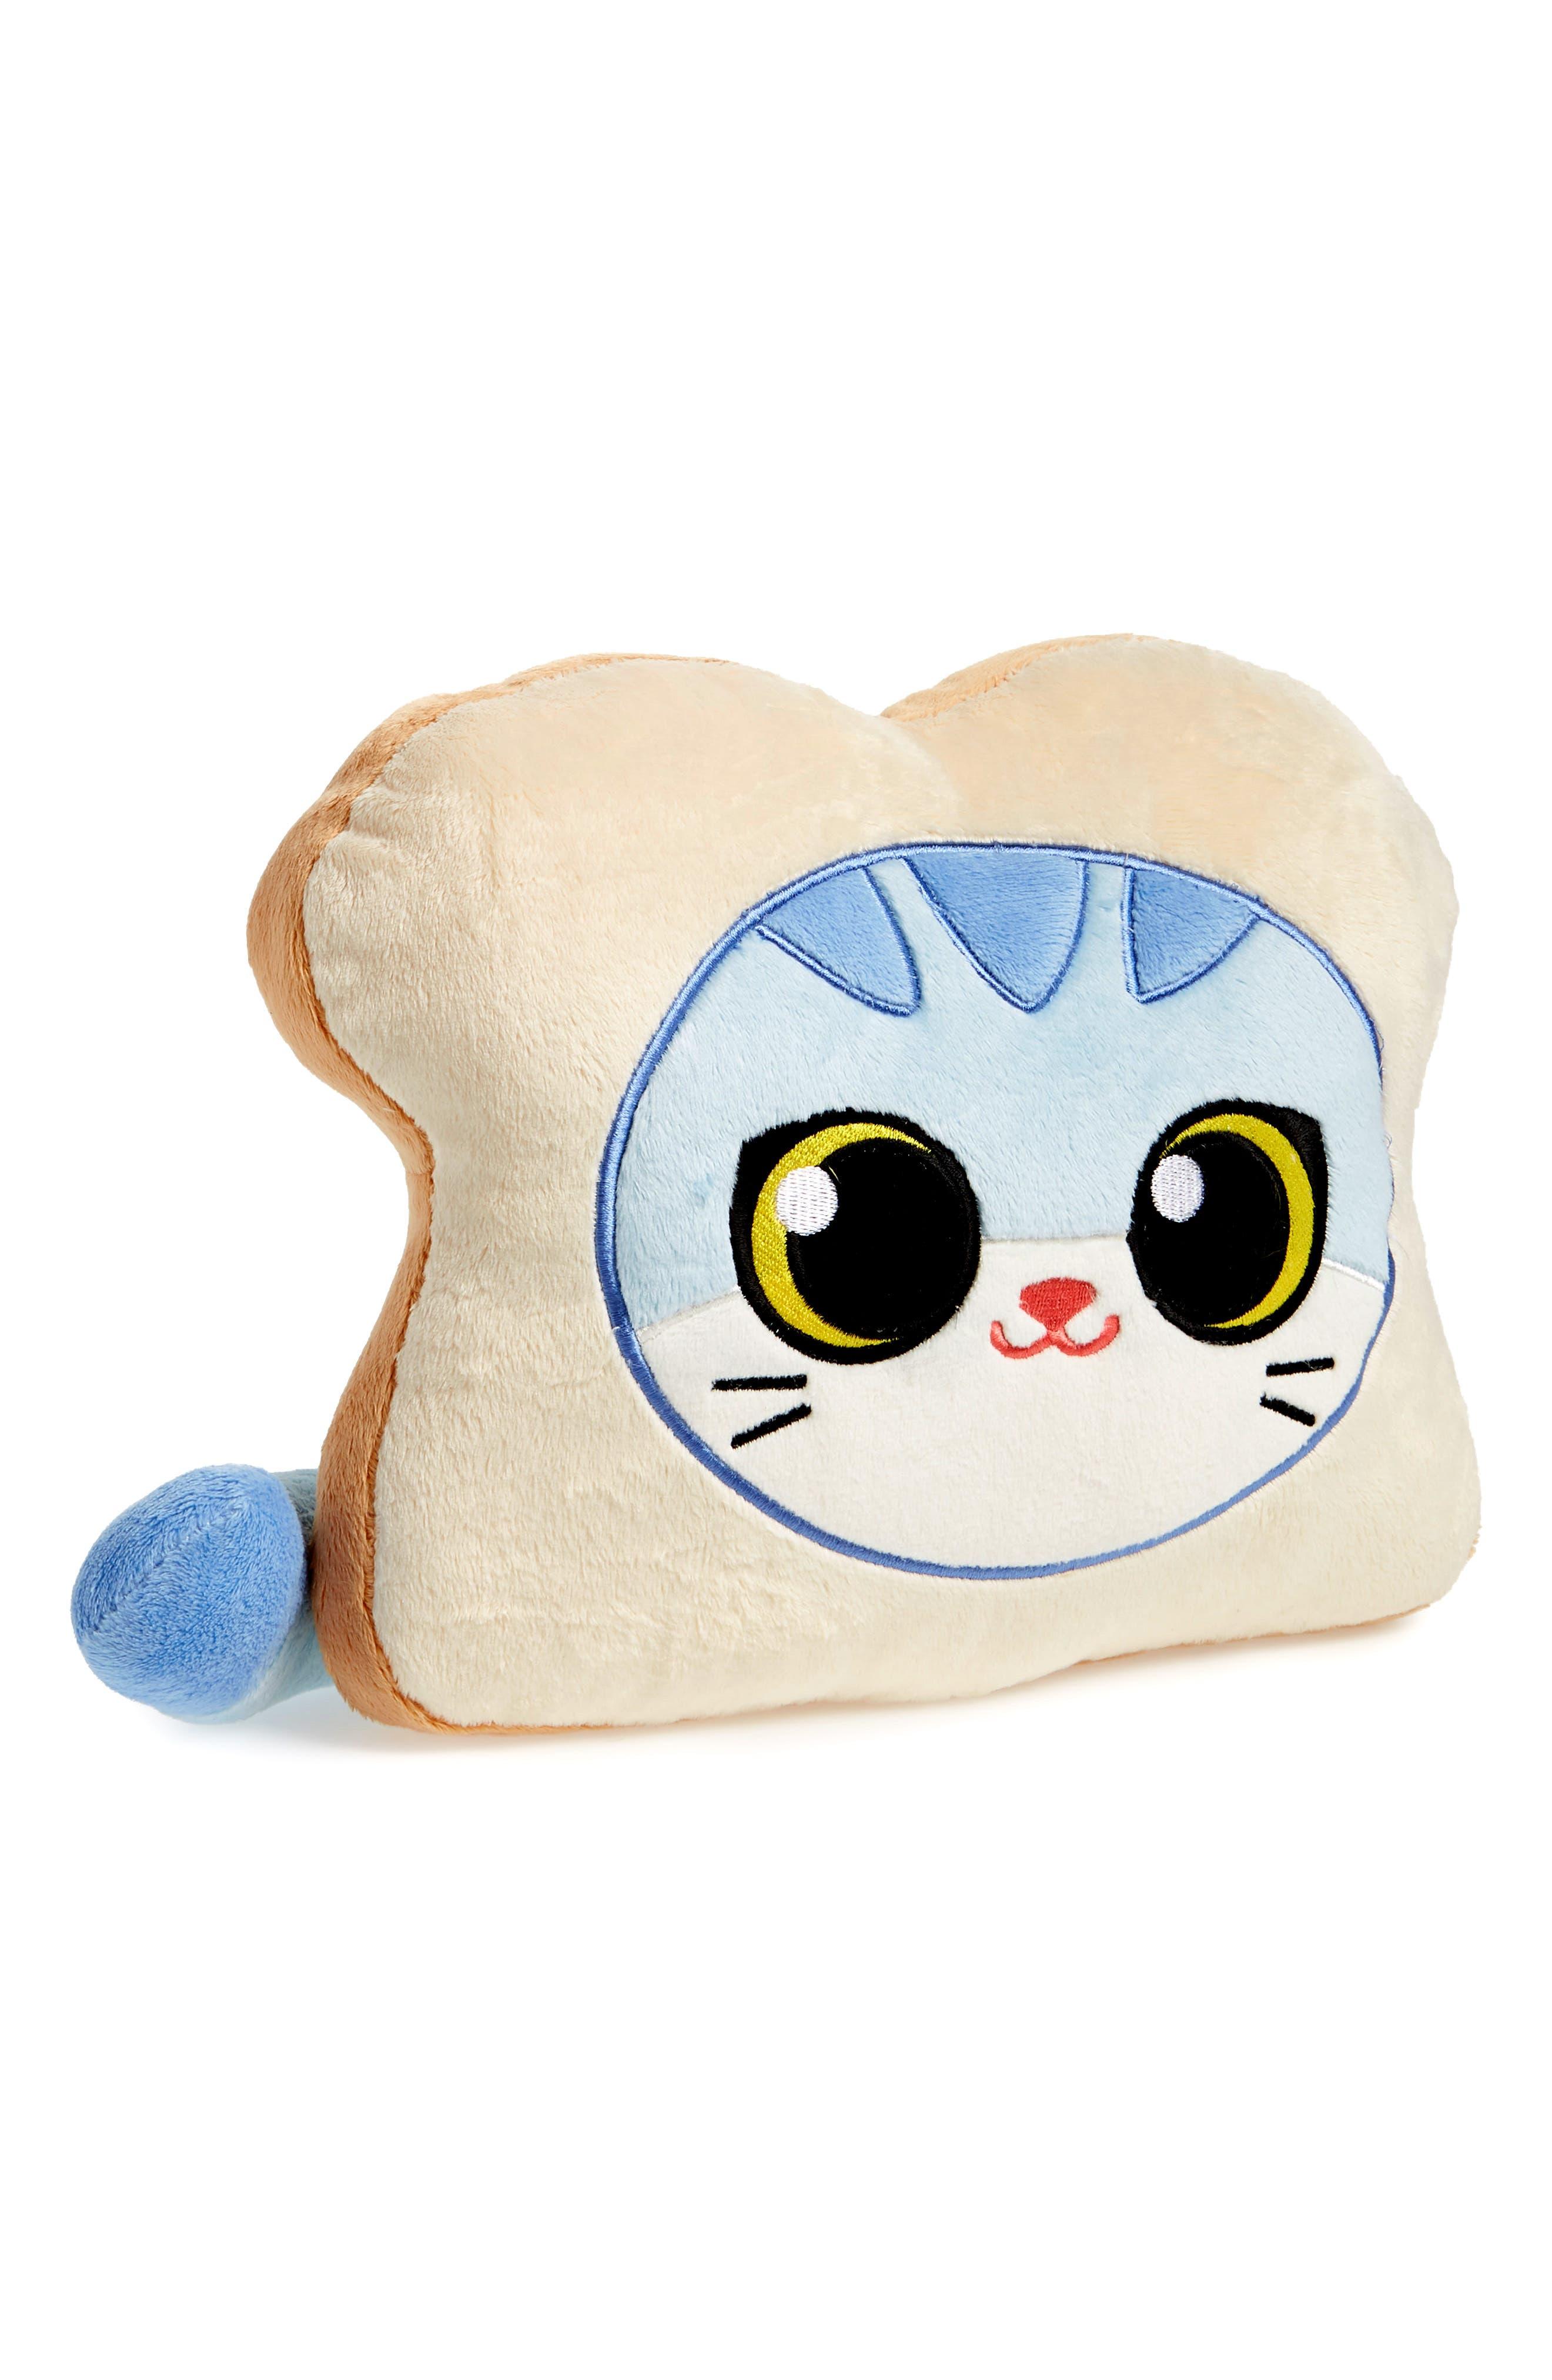 Cat Bread Stuffed Pillow,                             Main thumbnail 1, color,